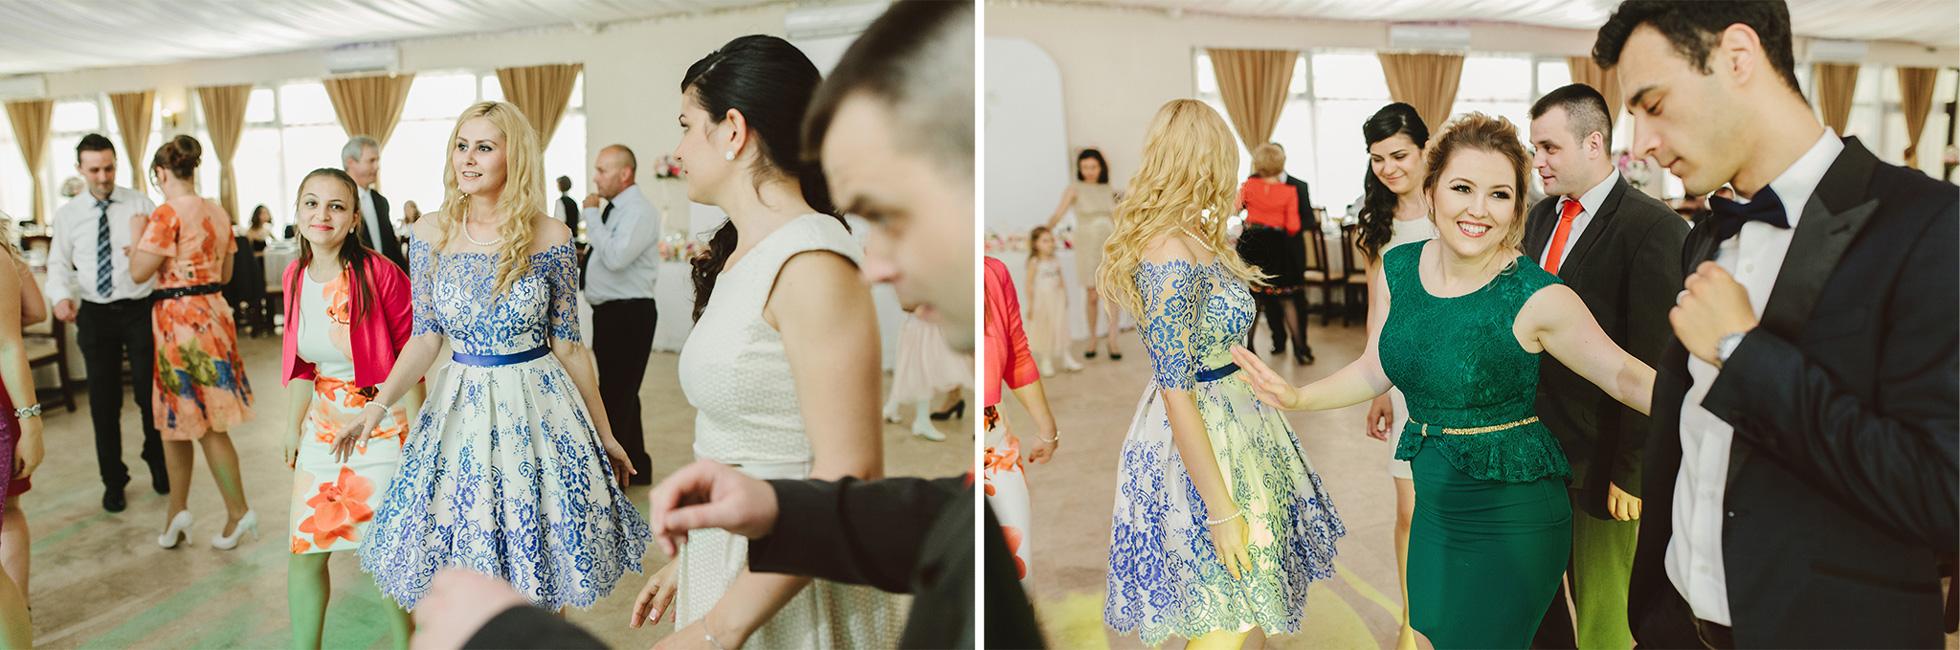 Liana-+-Florin-{wedding}-217